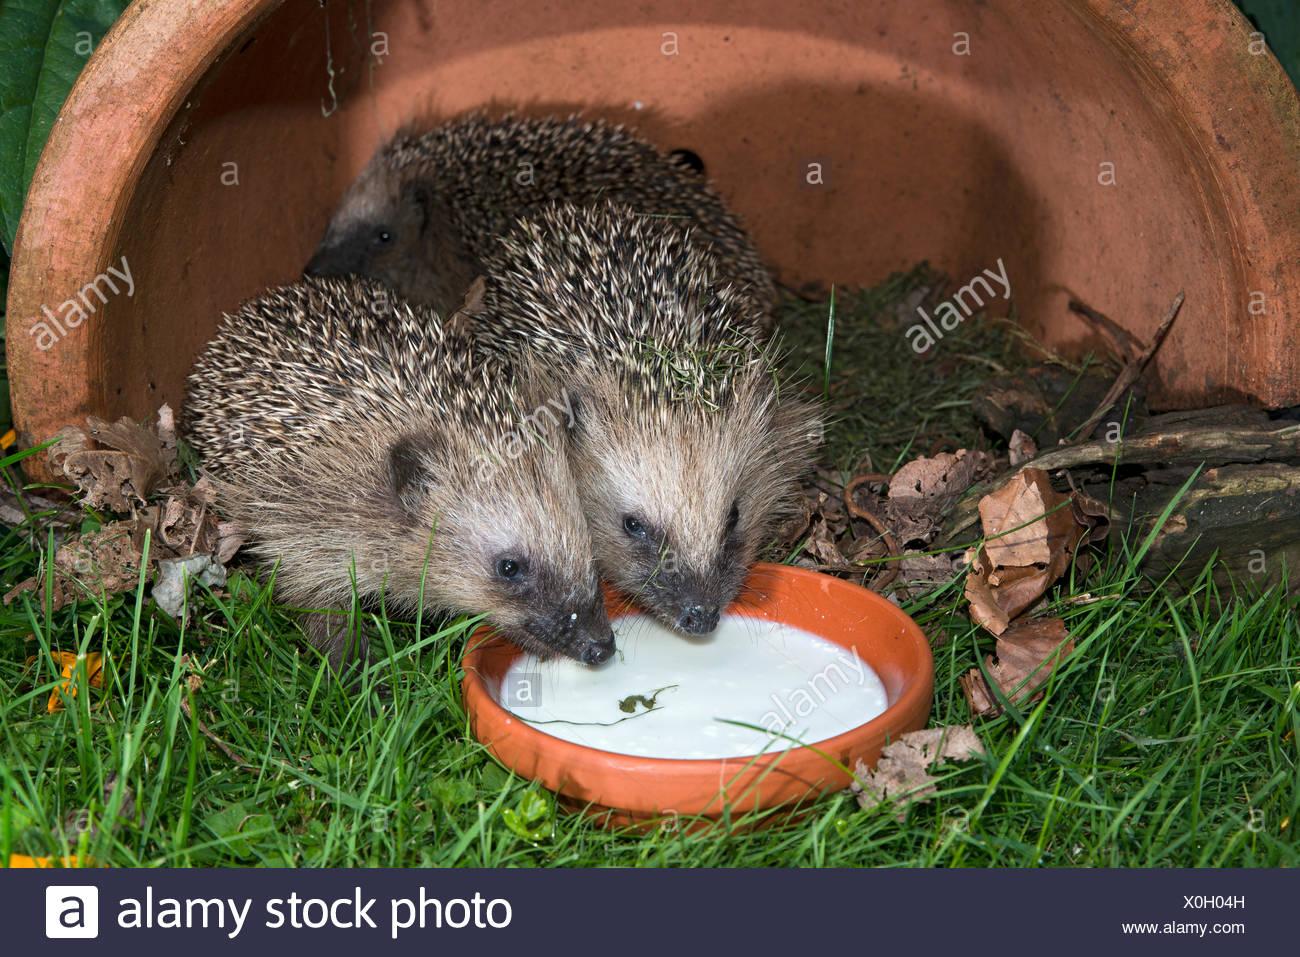 European hedgehogs (Erinaceus europaeus), Tyrol, Austria - Stock Image